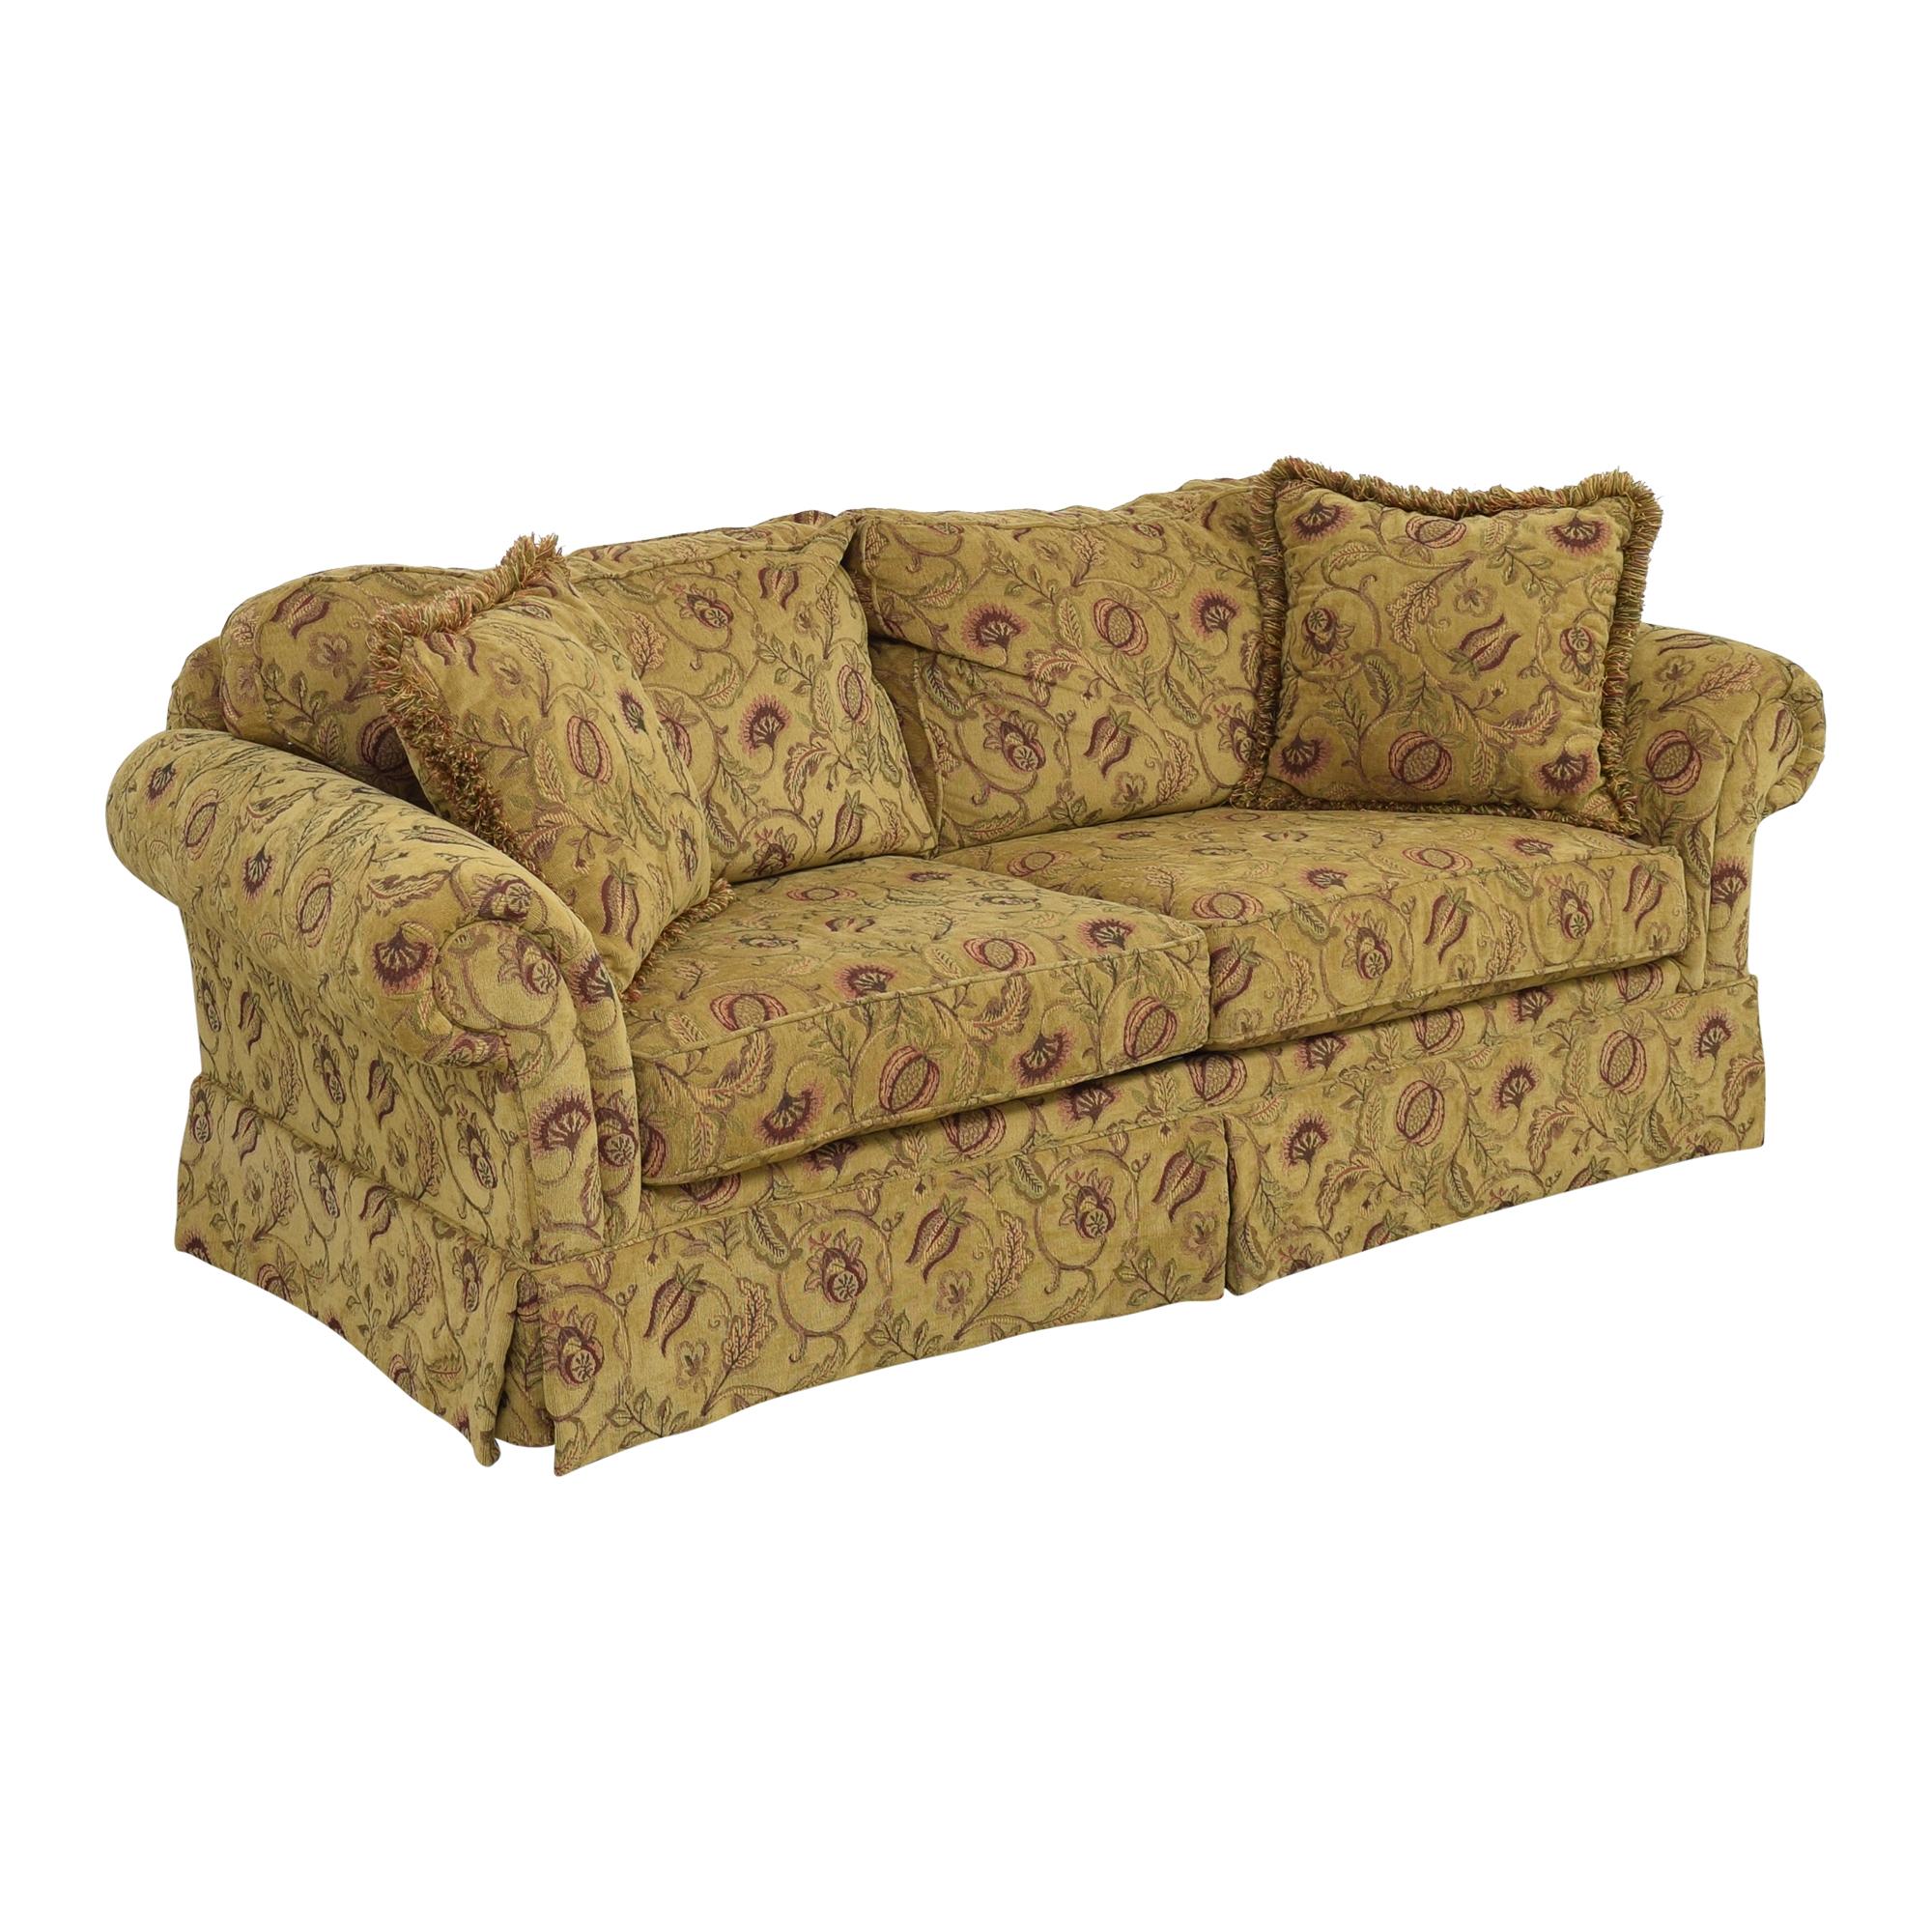 Broyhill Furniture Broyhill Furniture Two Cushion Skirted Sofa price